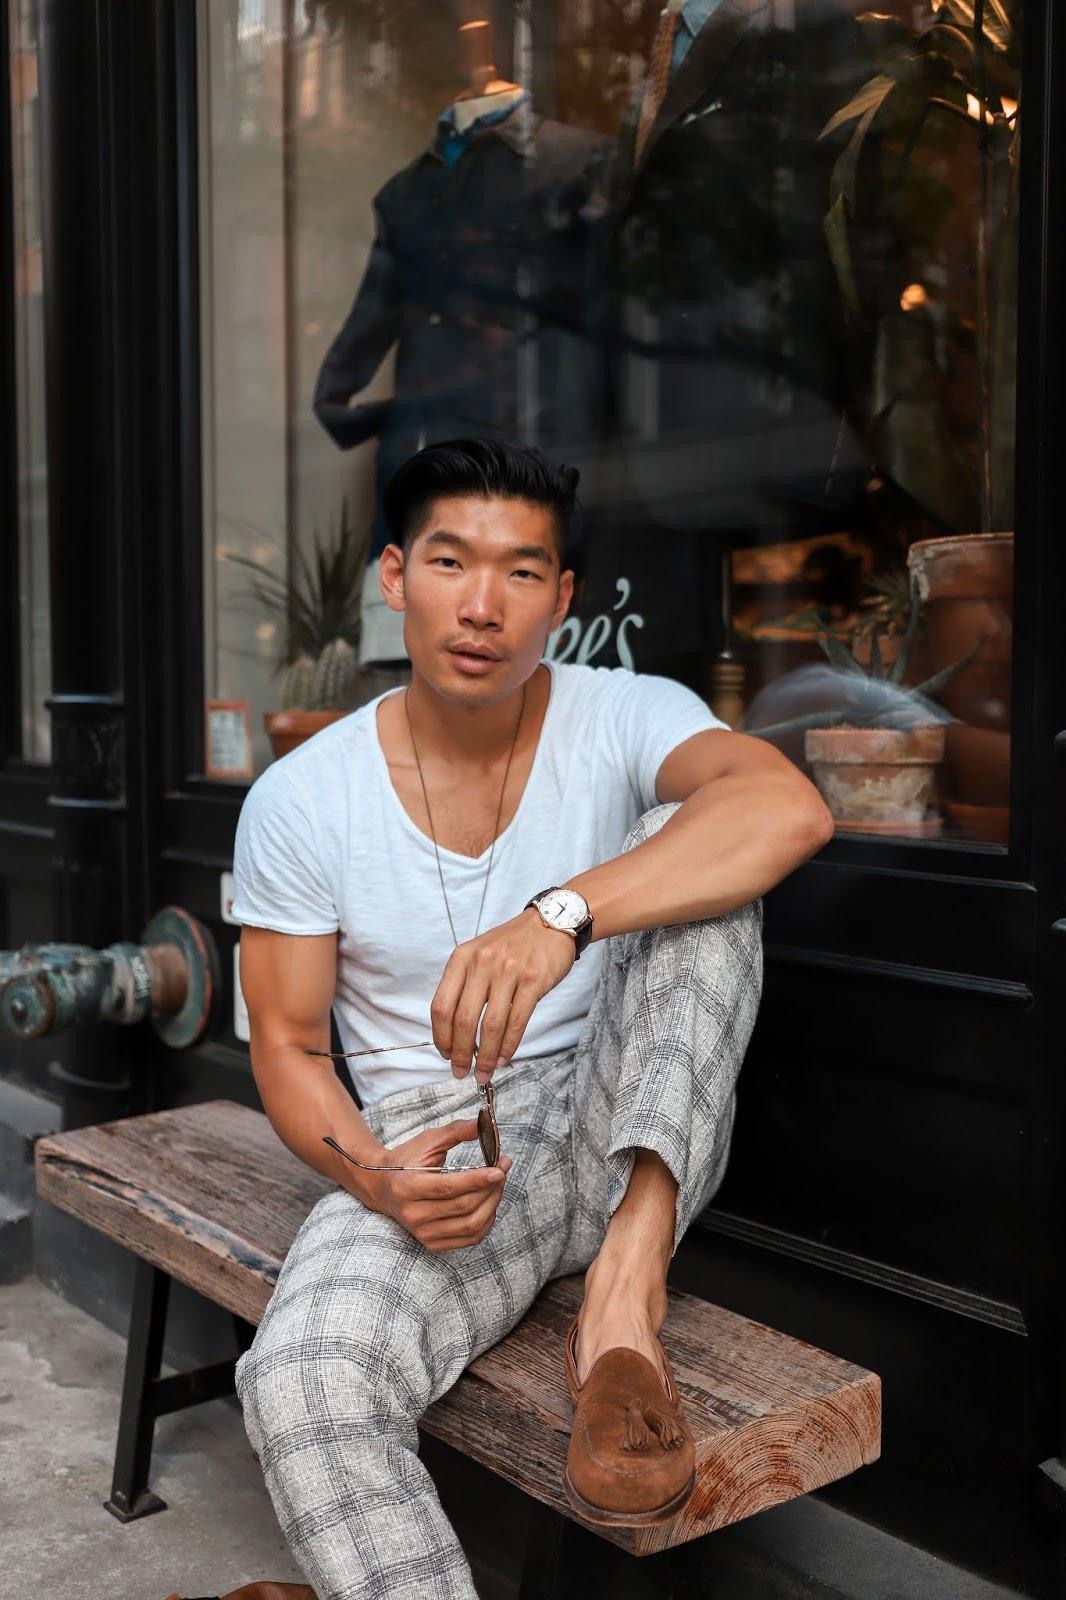 Big Asian boy blogspots and